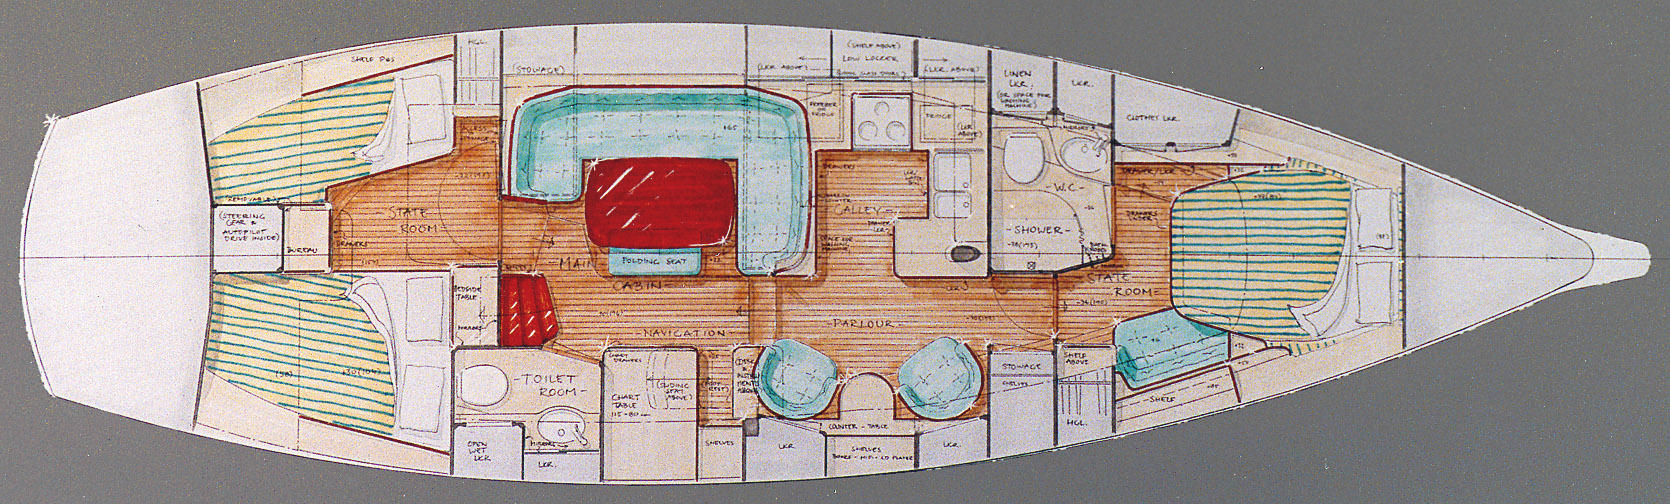 Interior layout for Fantasi 44 PH #1, 'Dawdle'